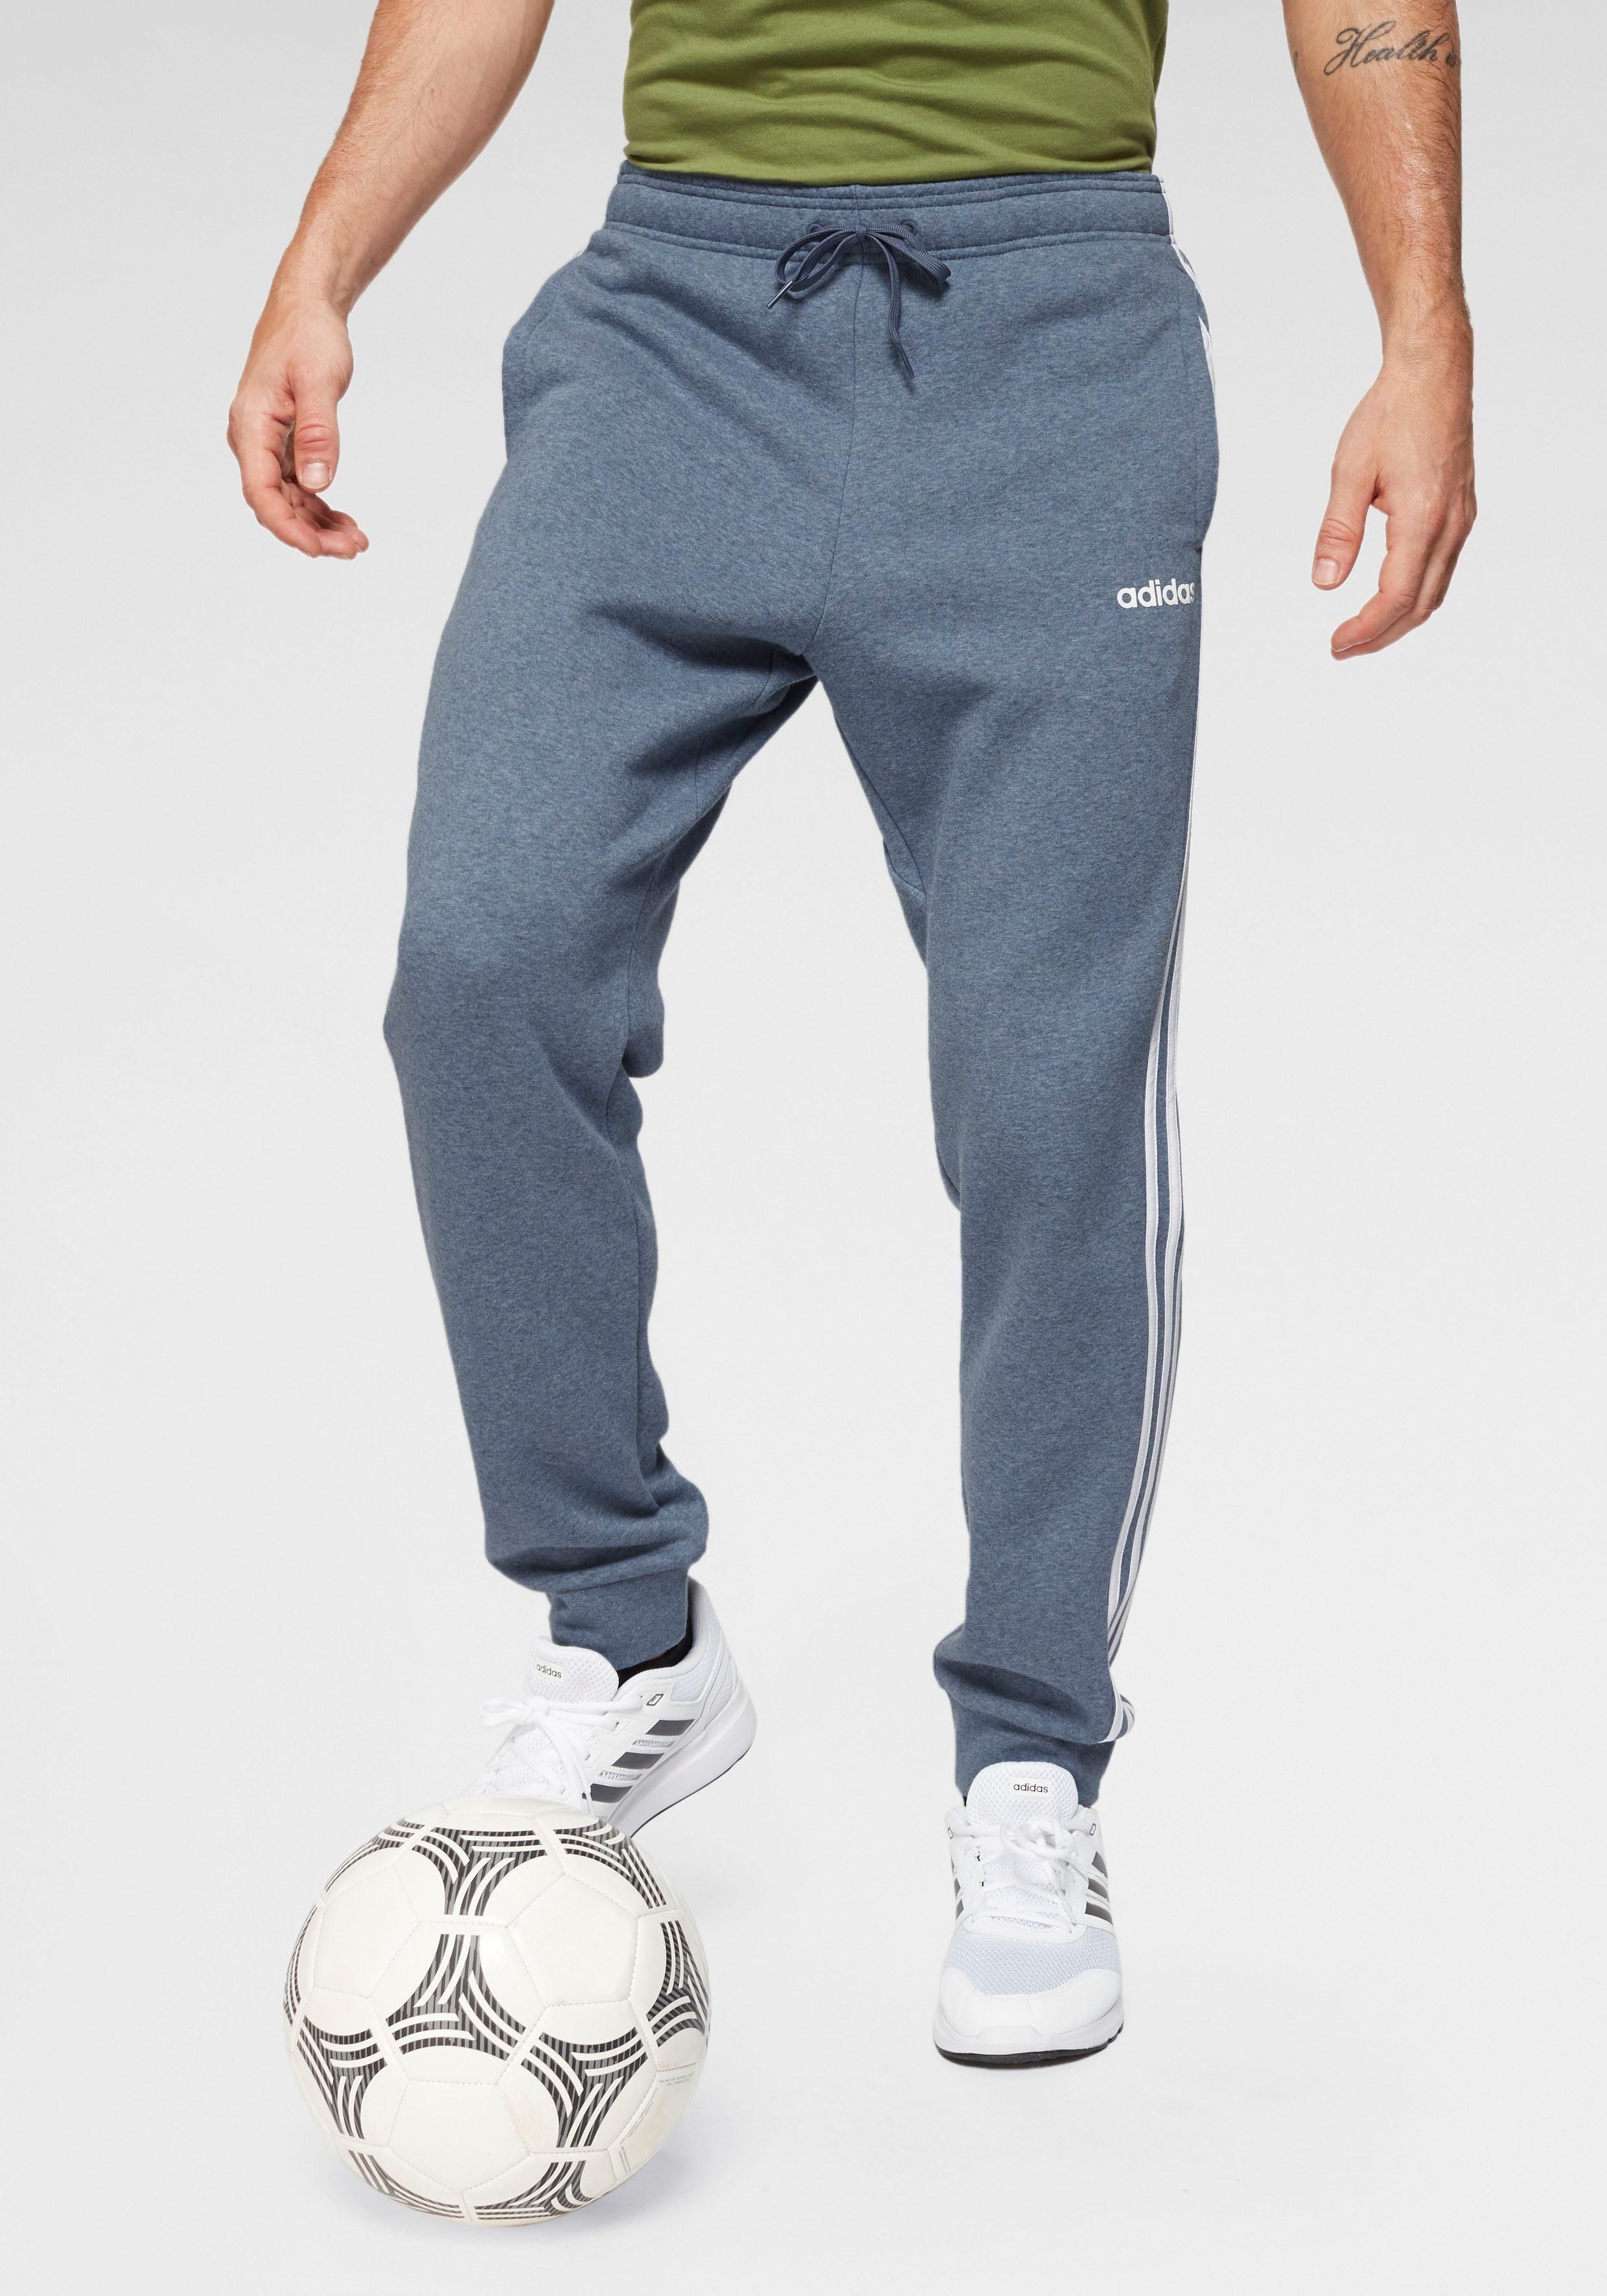 adidas Jogginghose »E 3 STRIPES T PANT FL« kaufen | OTTO